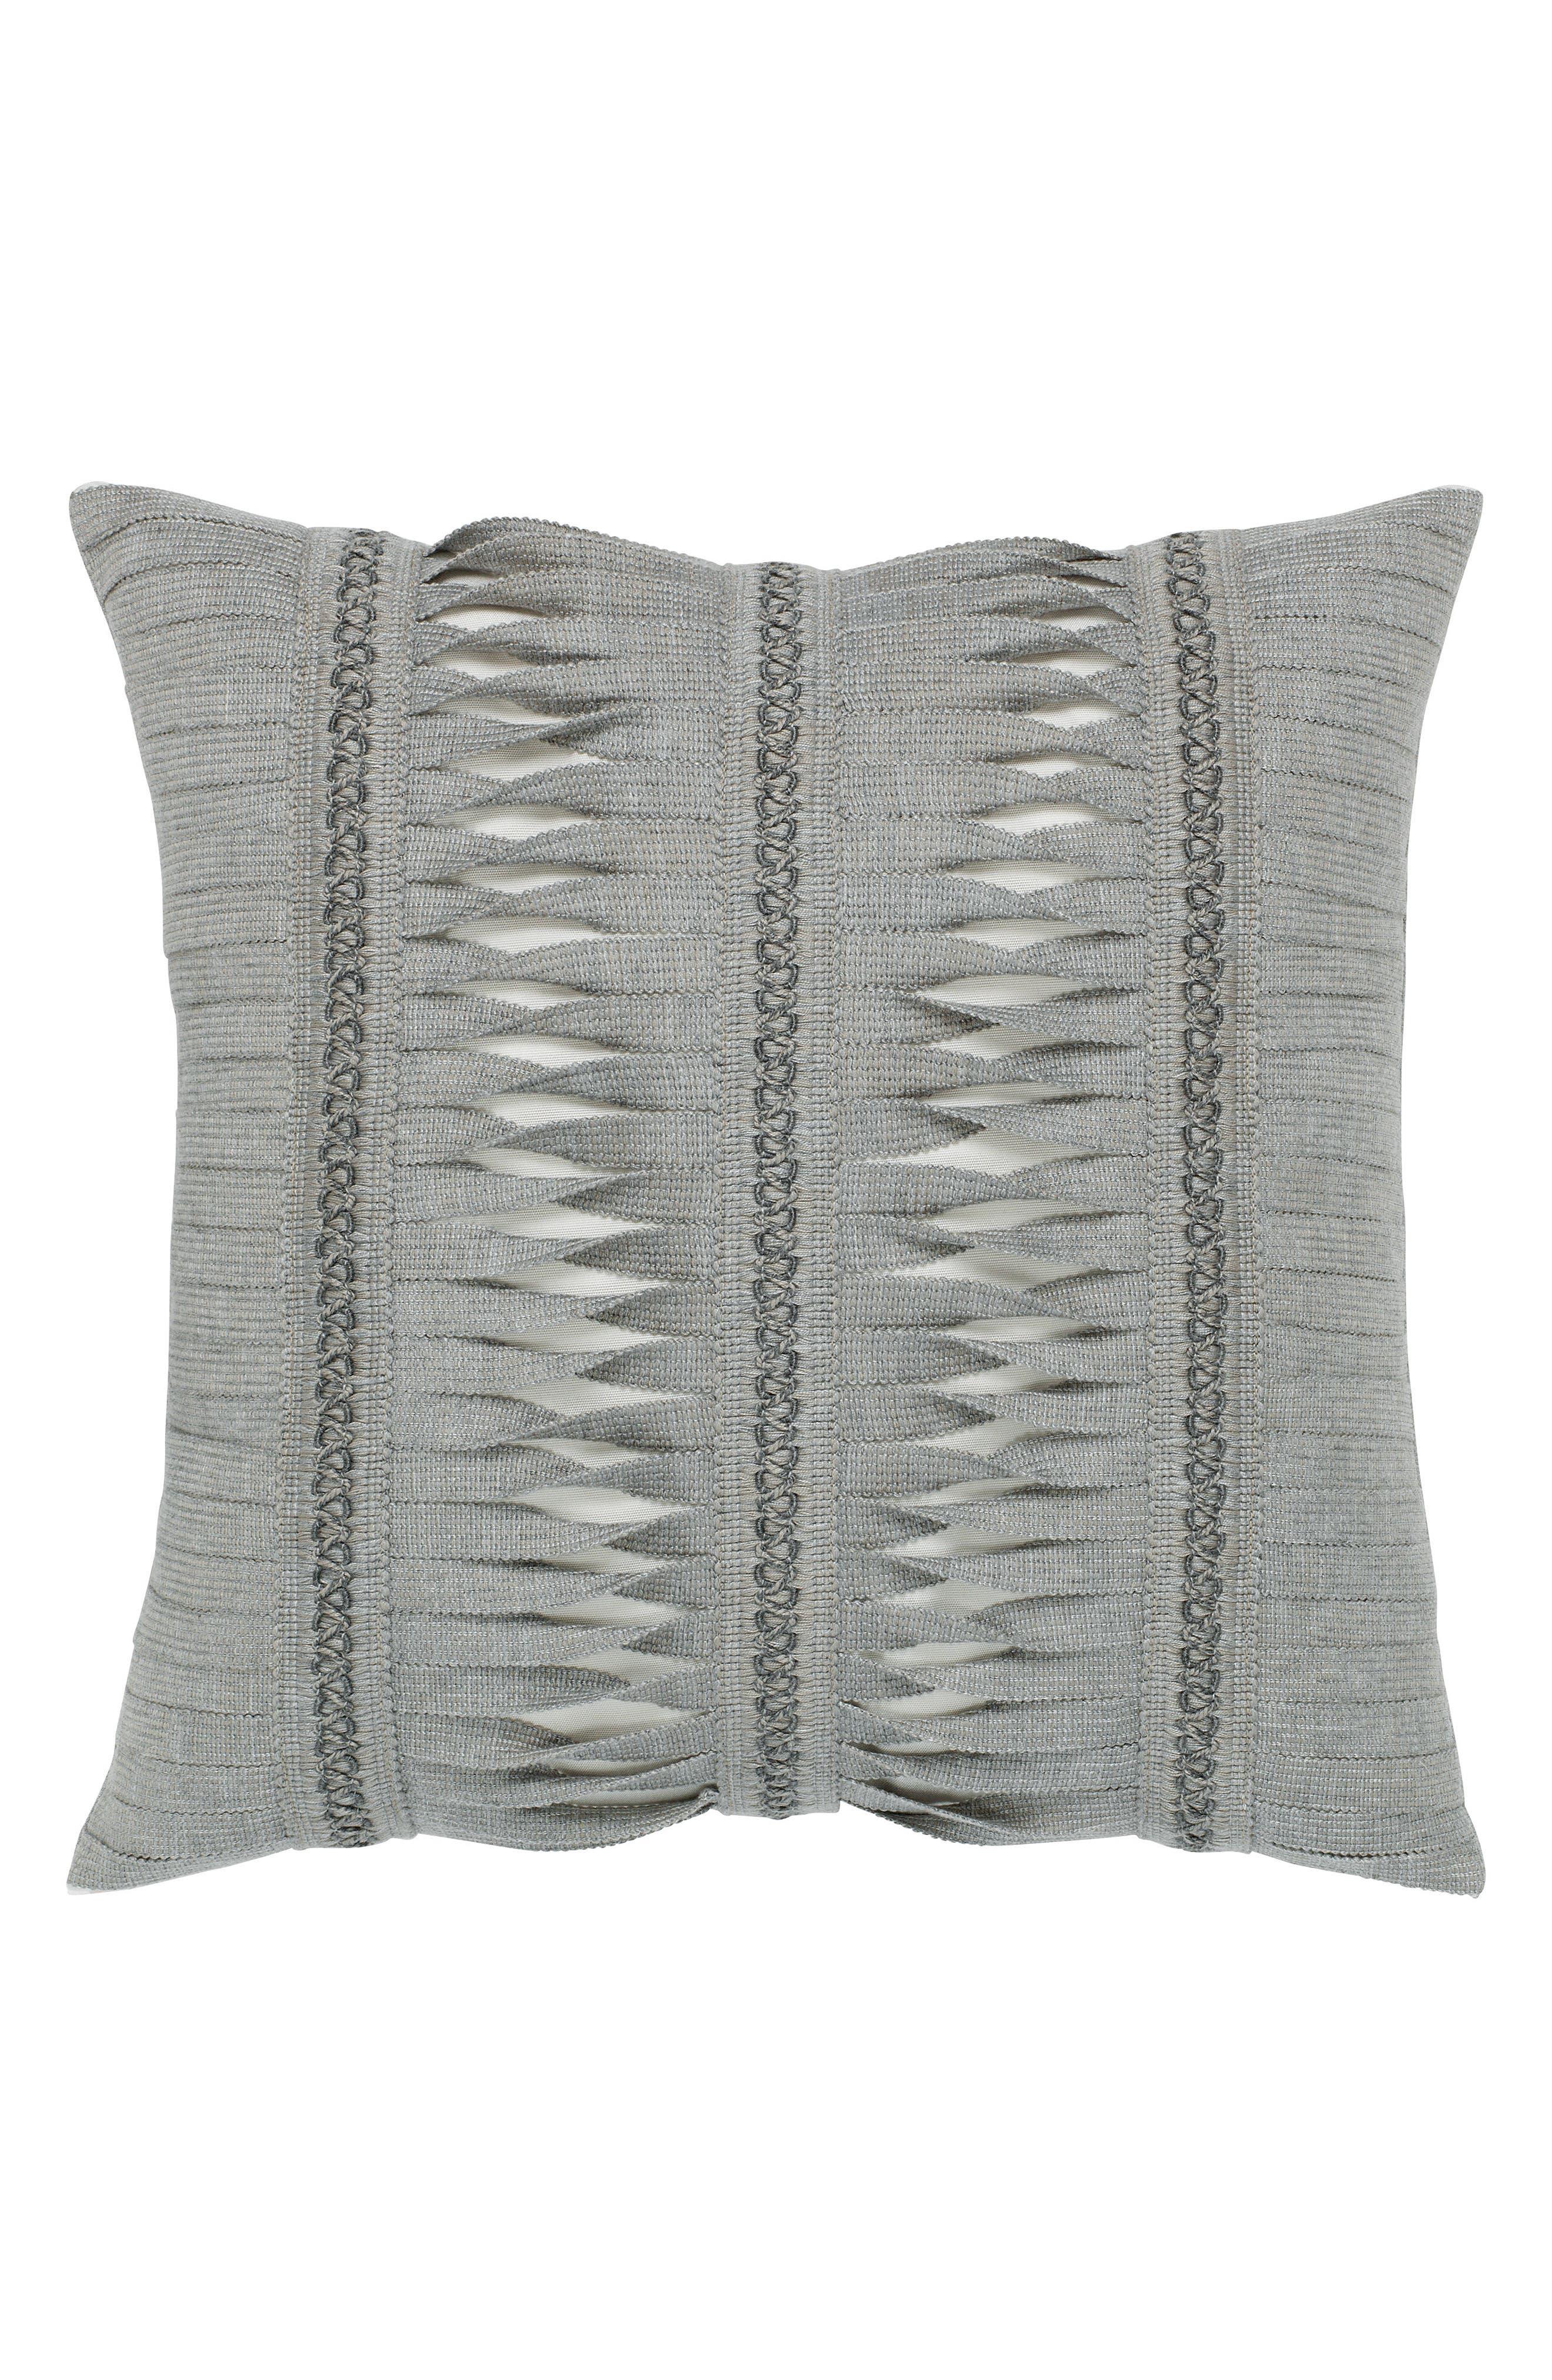 Gladiator Granite Indoor/Outdoor Accent Pillow,                         Main,                         color, 020